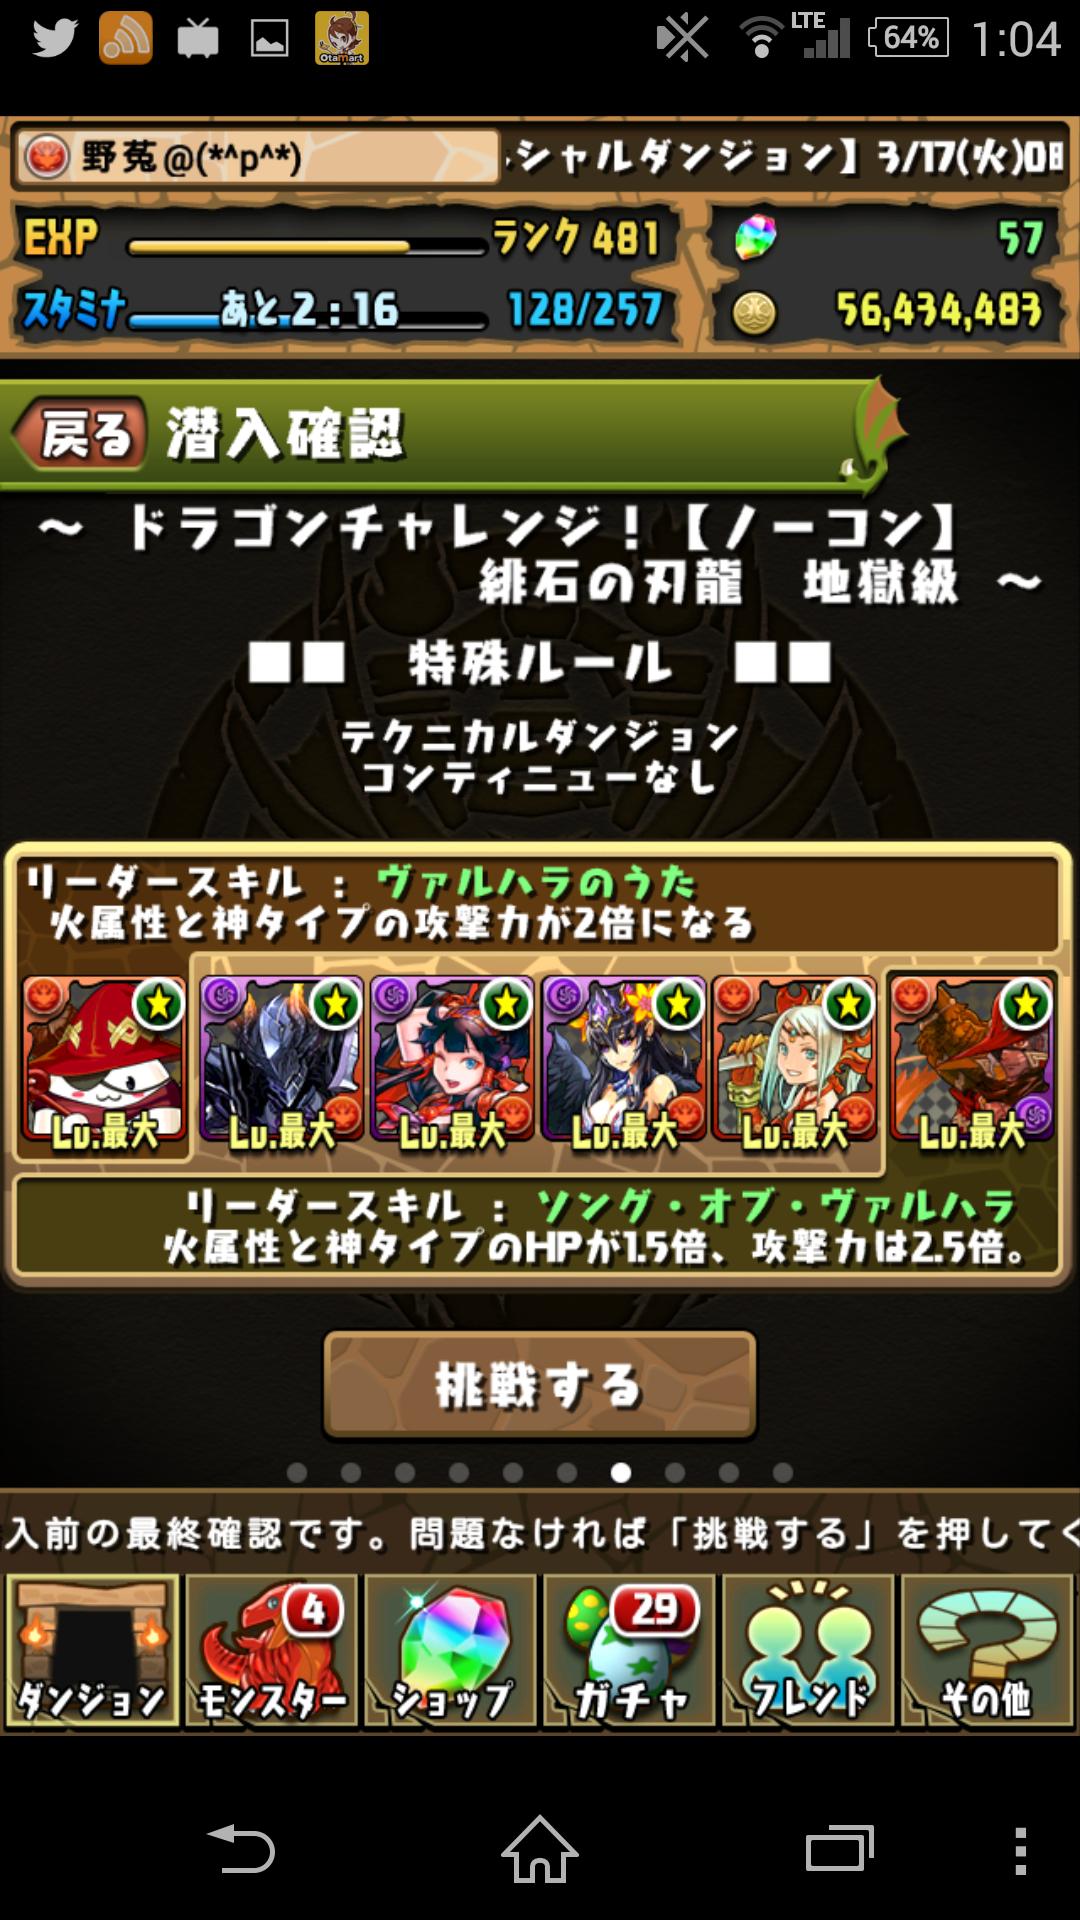 Screenshot_2015-03-18-01-04-10.png